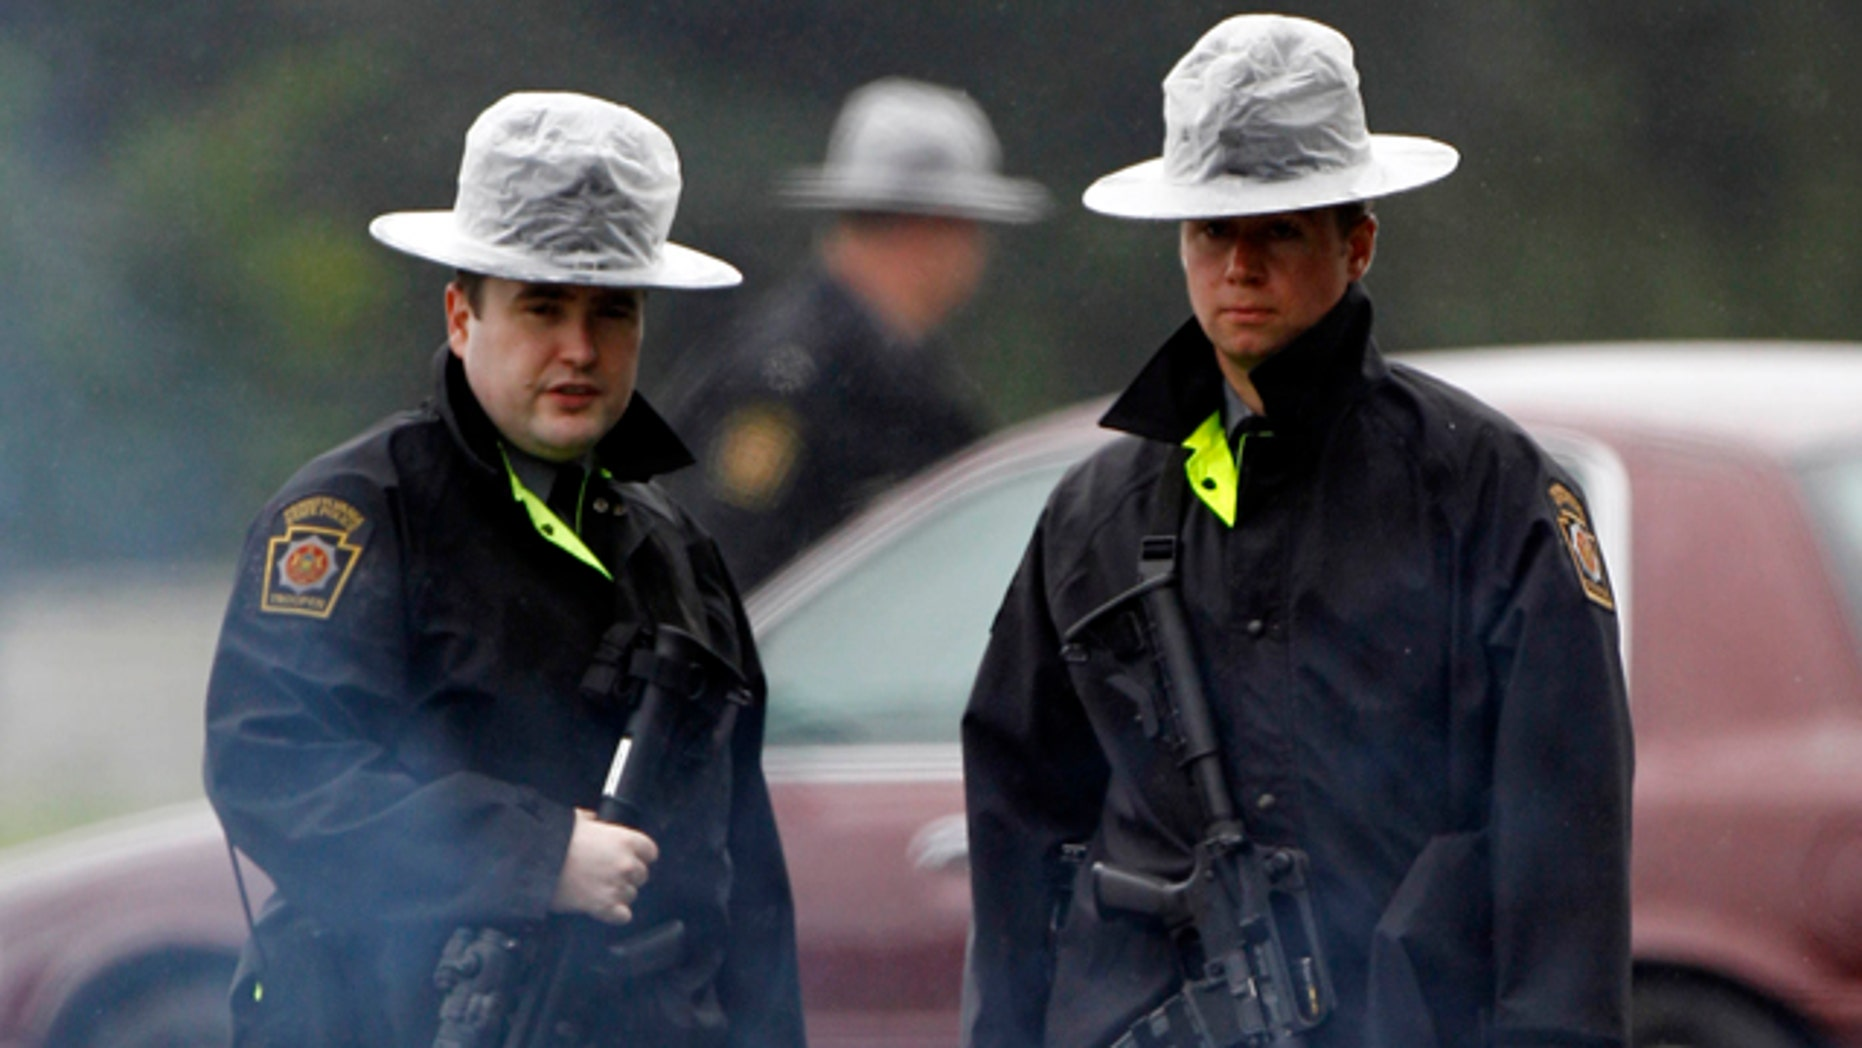 August 28, 2011: Pennsylvania State Police troopers man a roadblock in Furlong, Pa. (AP)